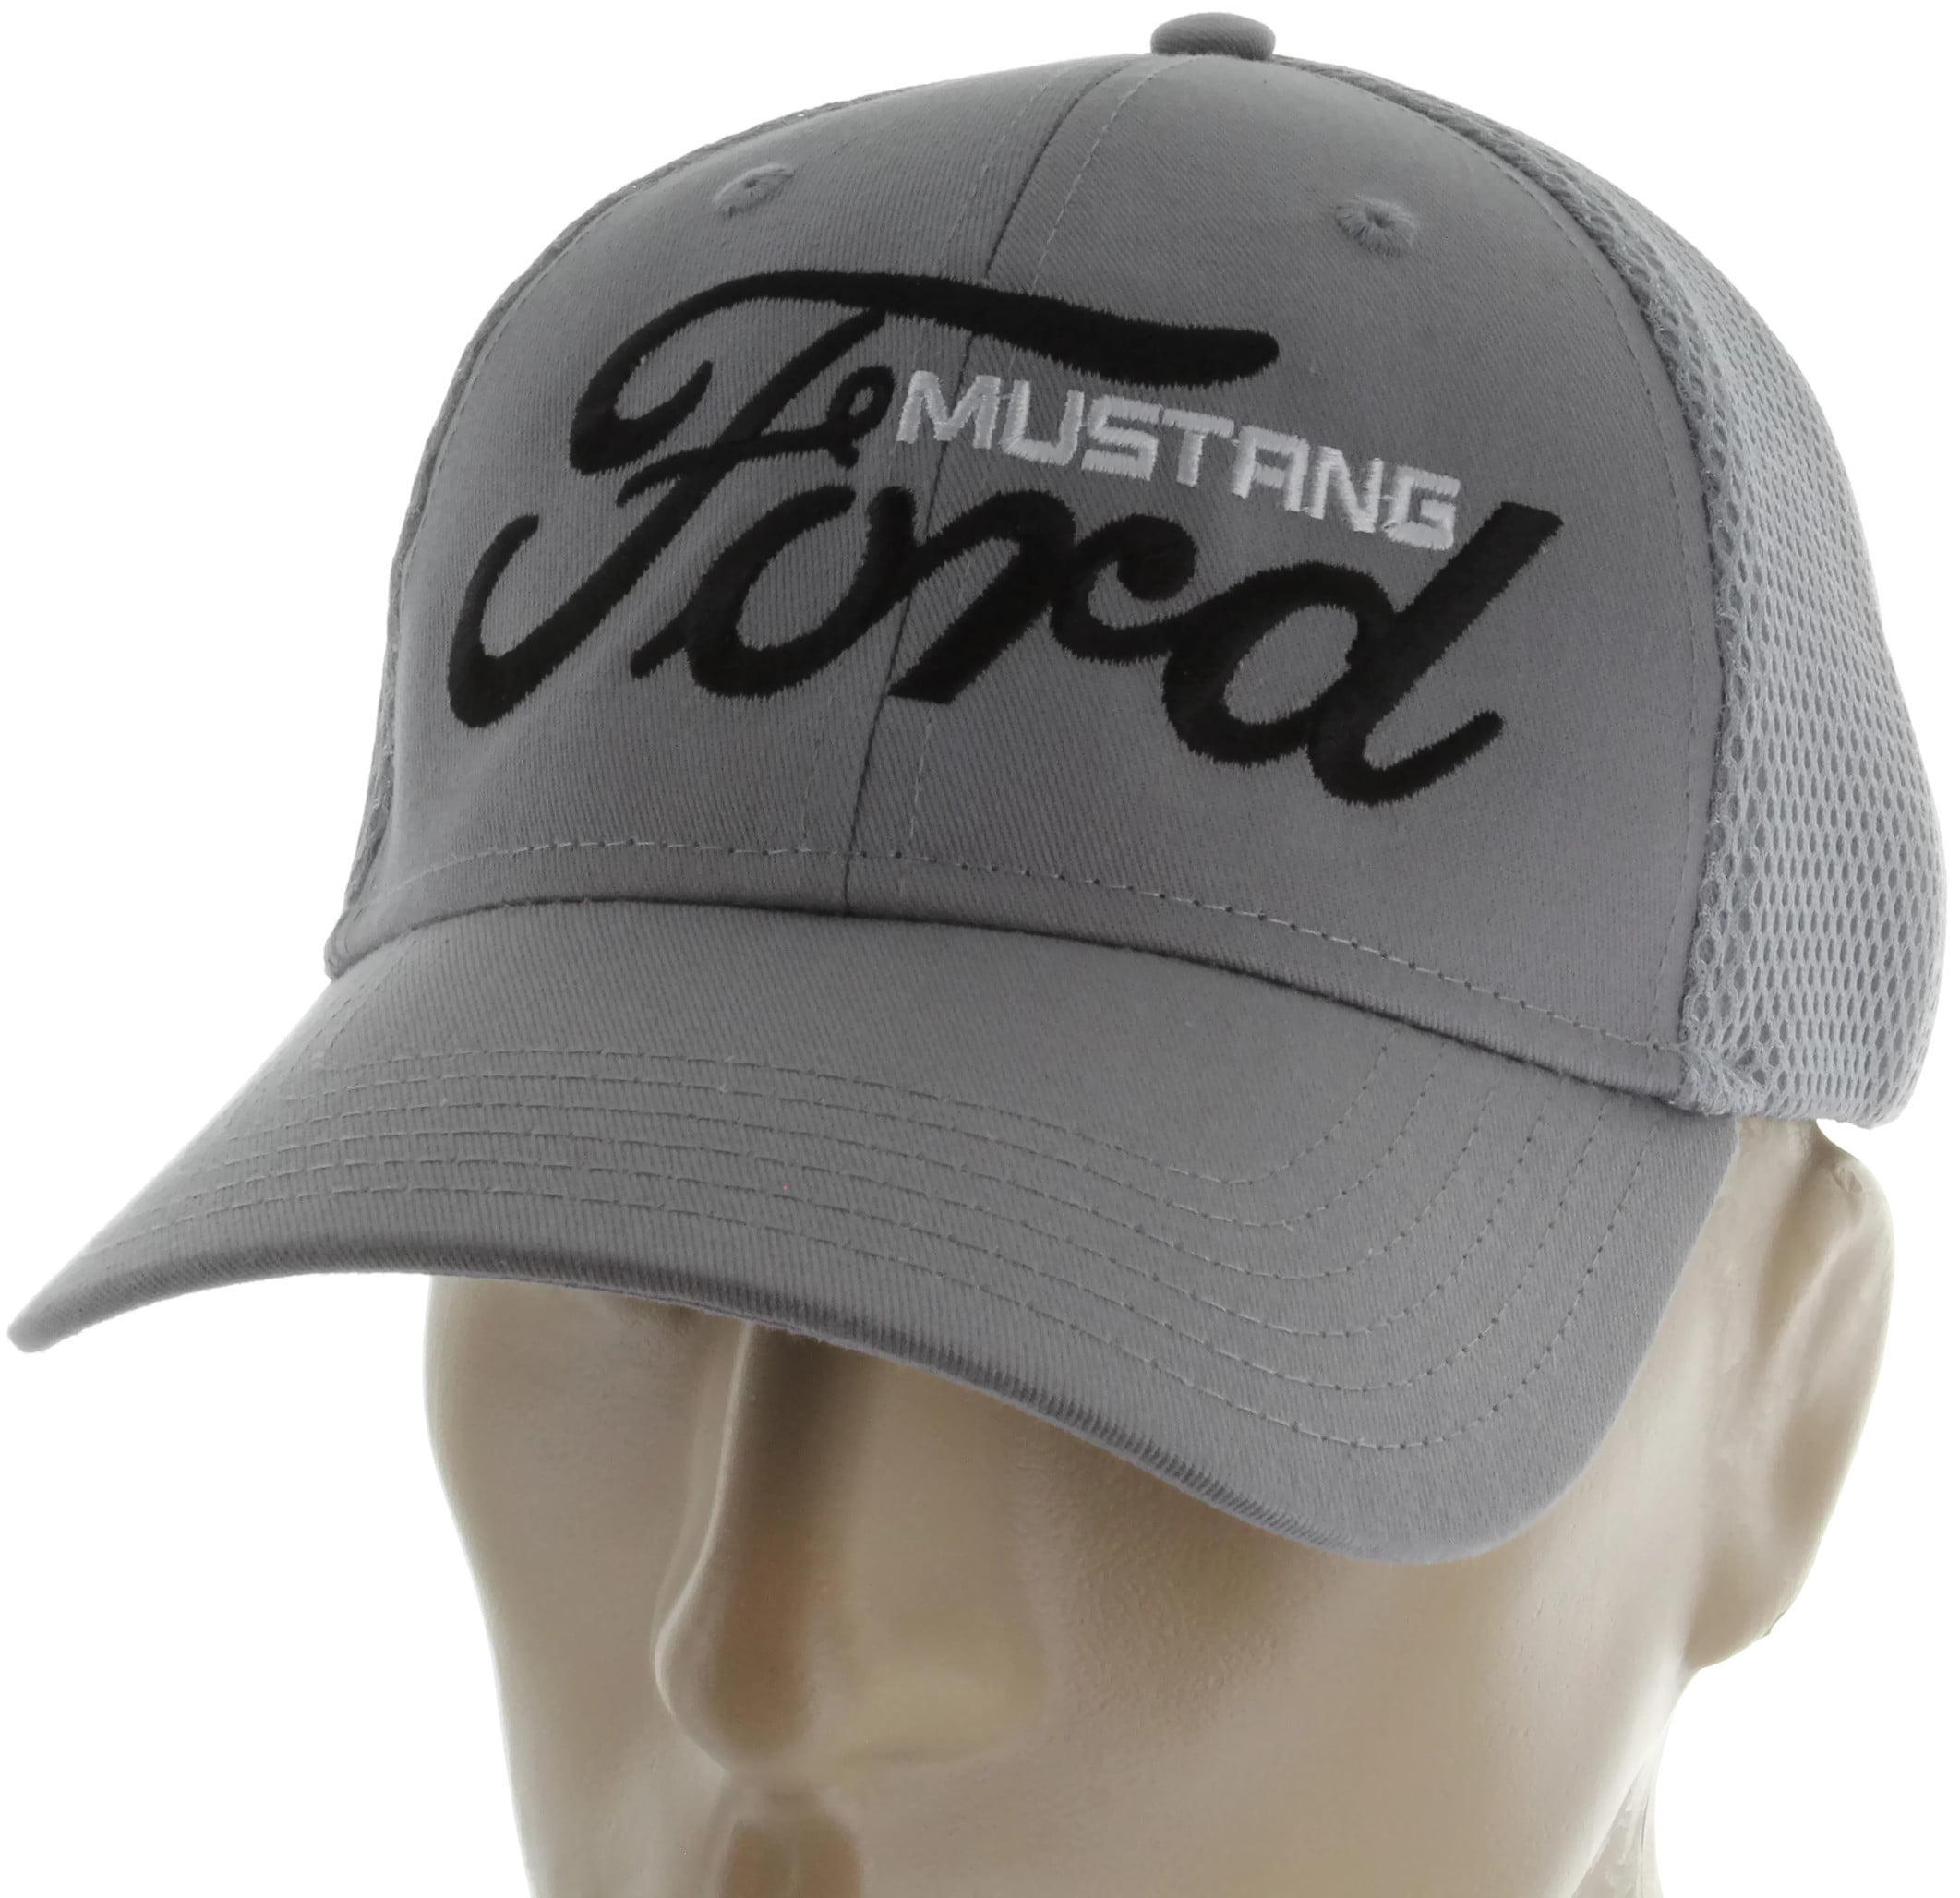 Grey Ford Motor Company Trucker Style Mesh Cap Hat